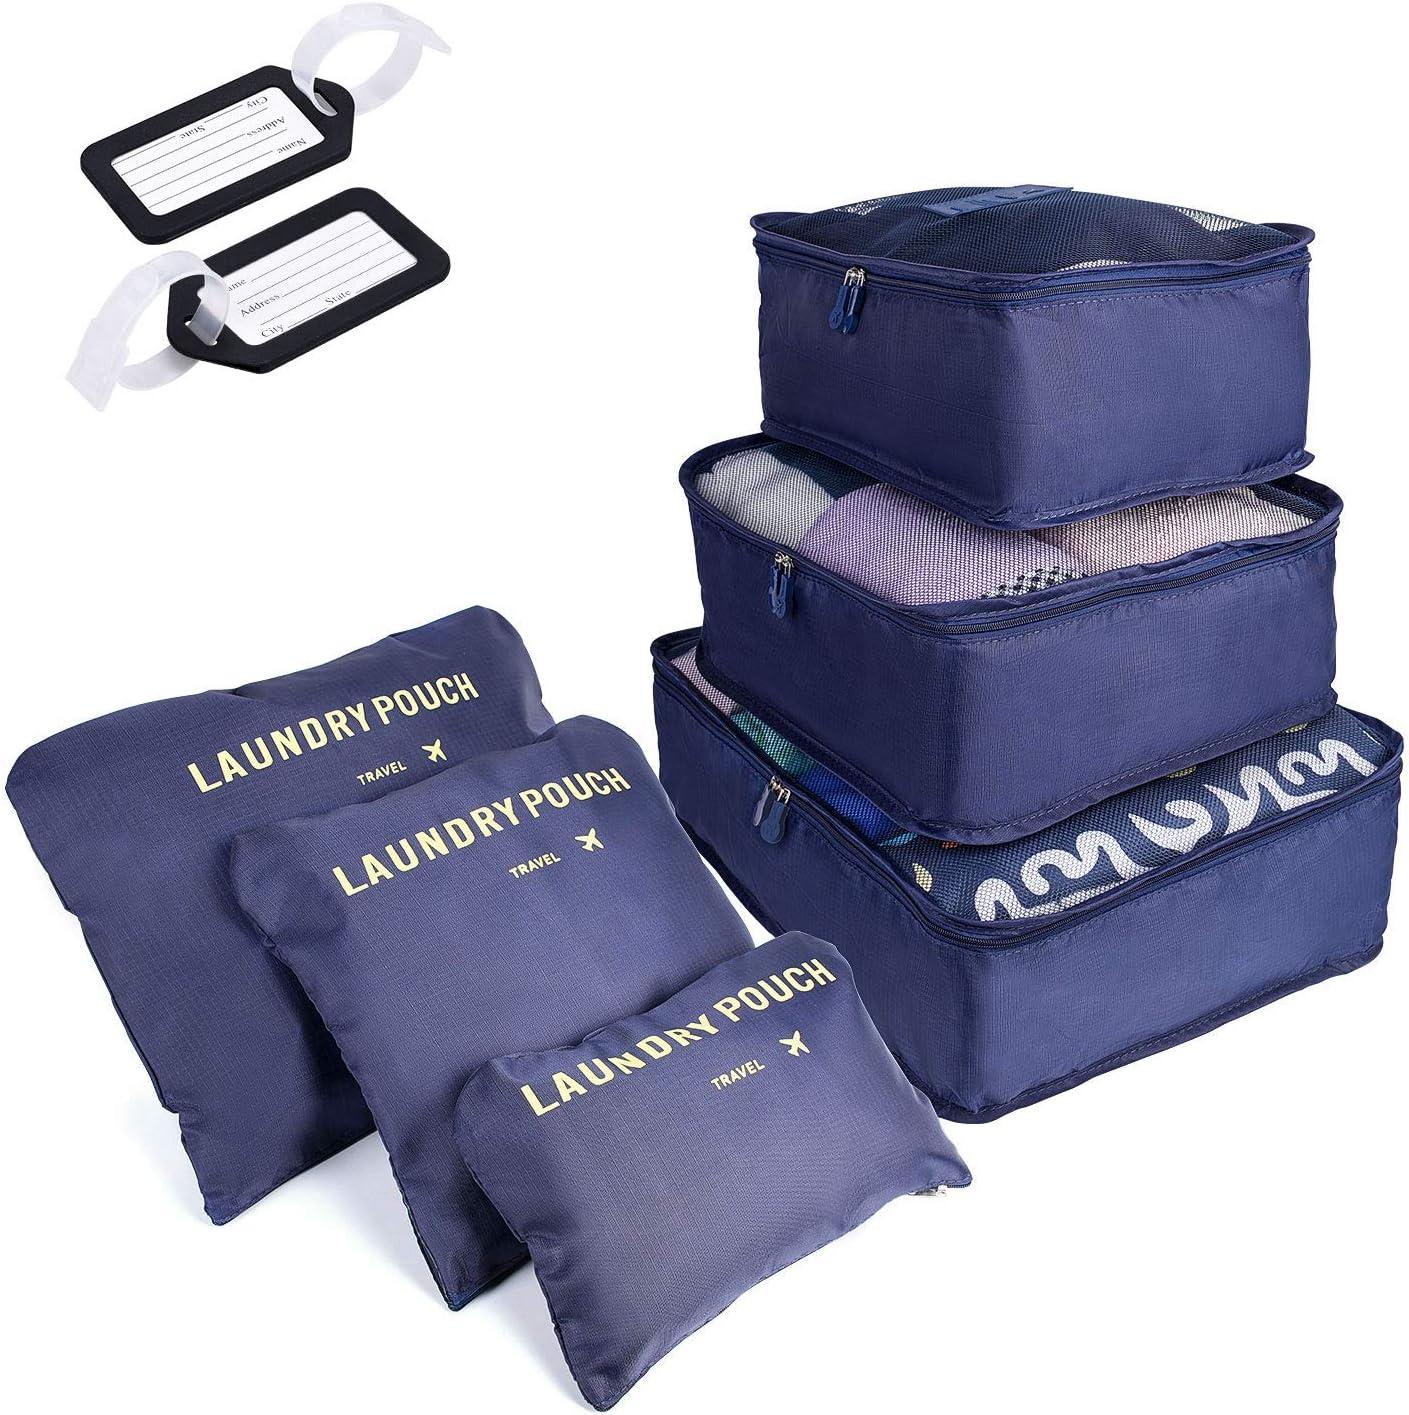 6 PCS Organizadores de Viaje para Maletas, Bolsas de Equipaje Impermeable Cubos Embalaje de Viaje Bolsas de Almacenamiento para Ropa Zapatos, Cosméticos Accesorios, Material Nylon (Azul Oscuro)